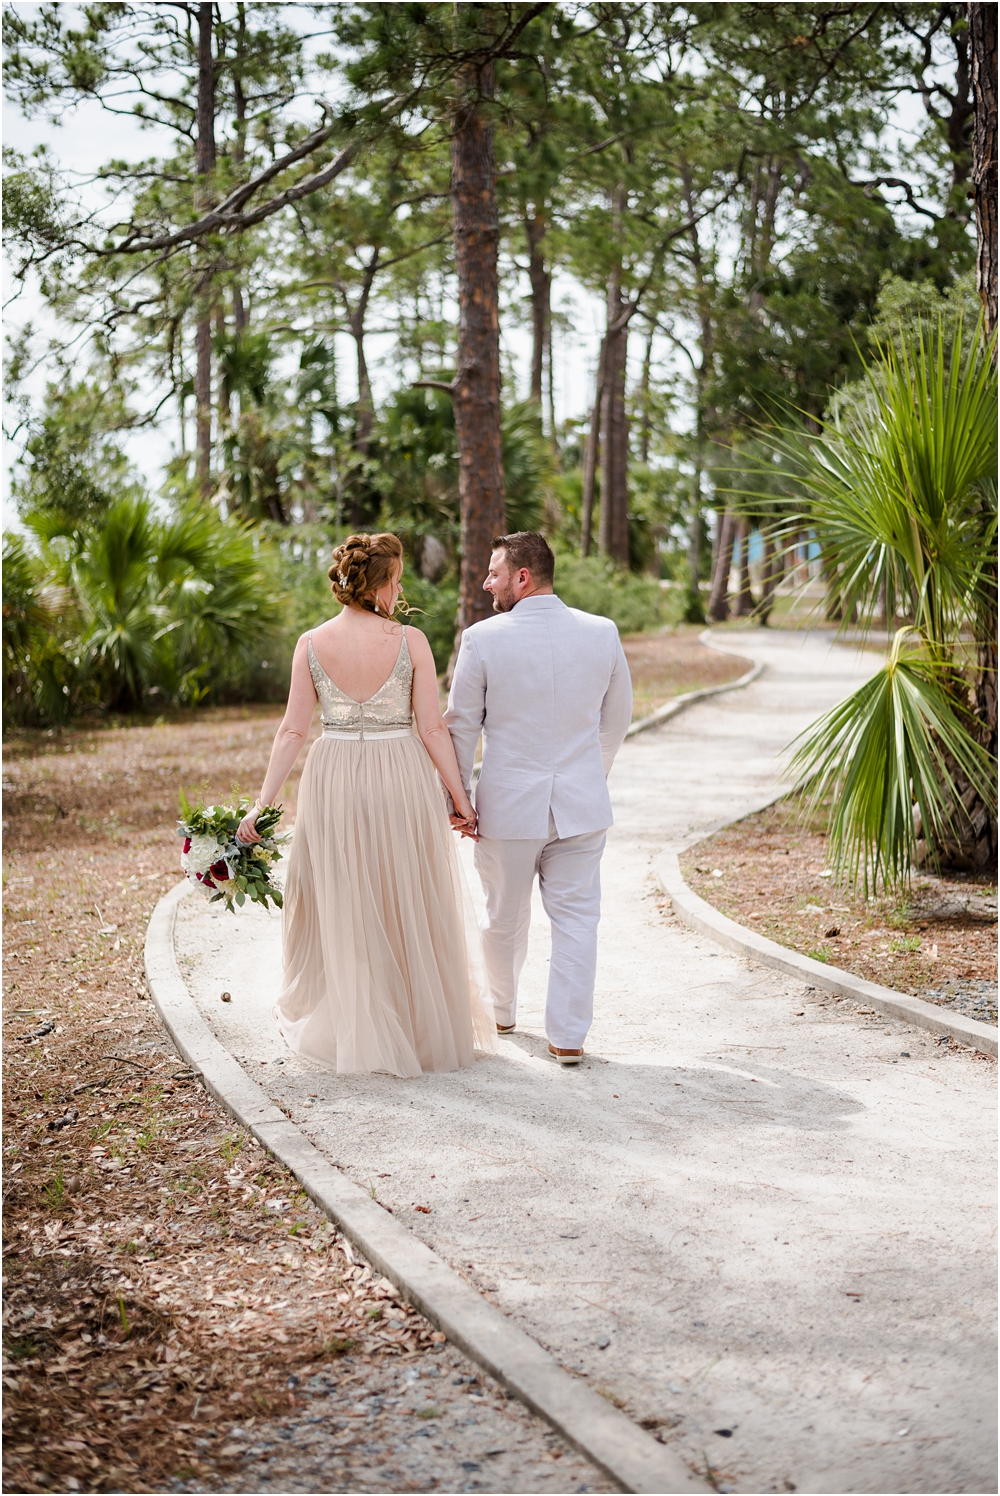 st-joe-florida-wedding-photographer-kiersten-grant-37.jpg